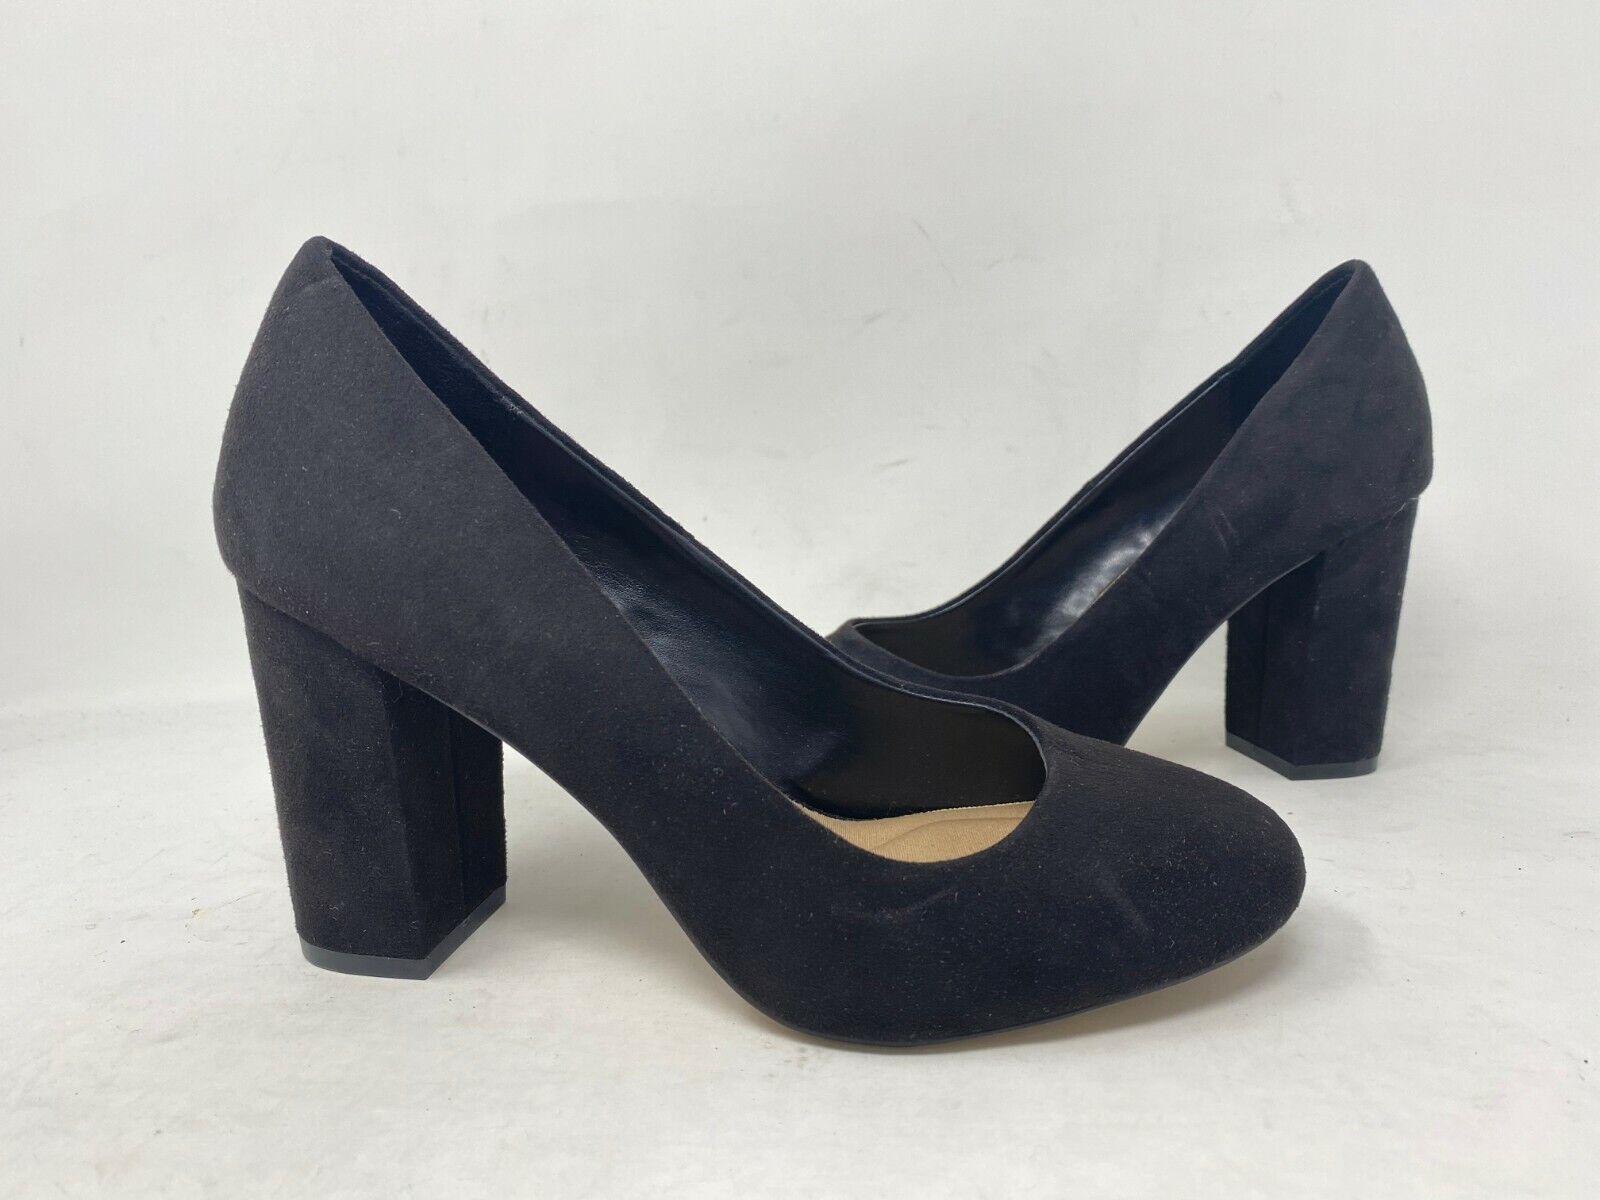 NEW! Apt.9 Women's Daylight Slip On Block High Heels Black #116367 196PQ tk